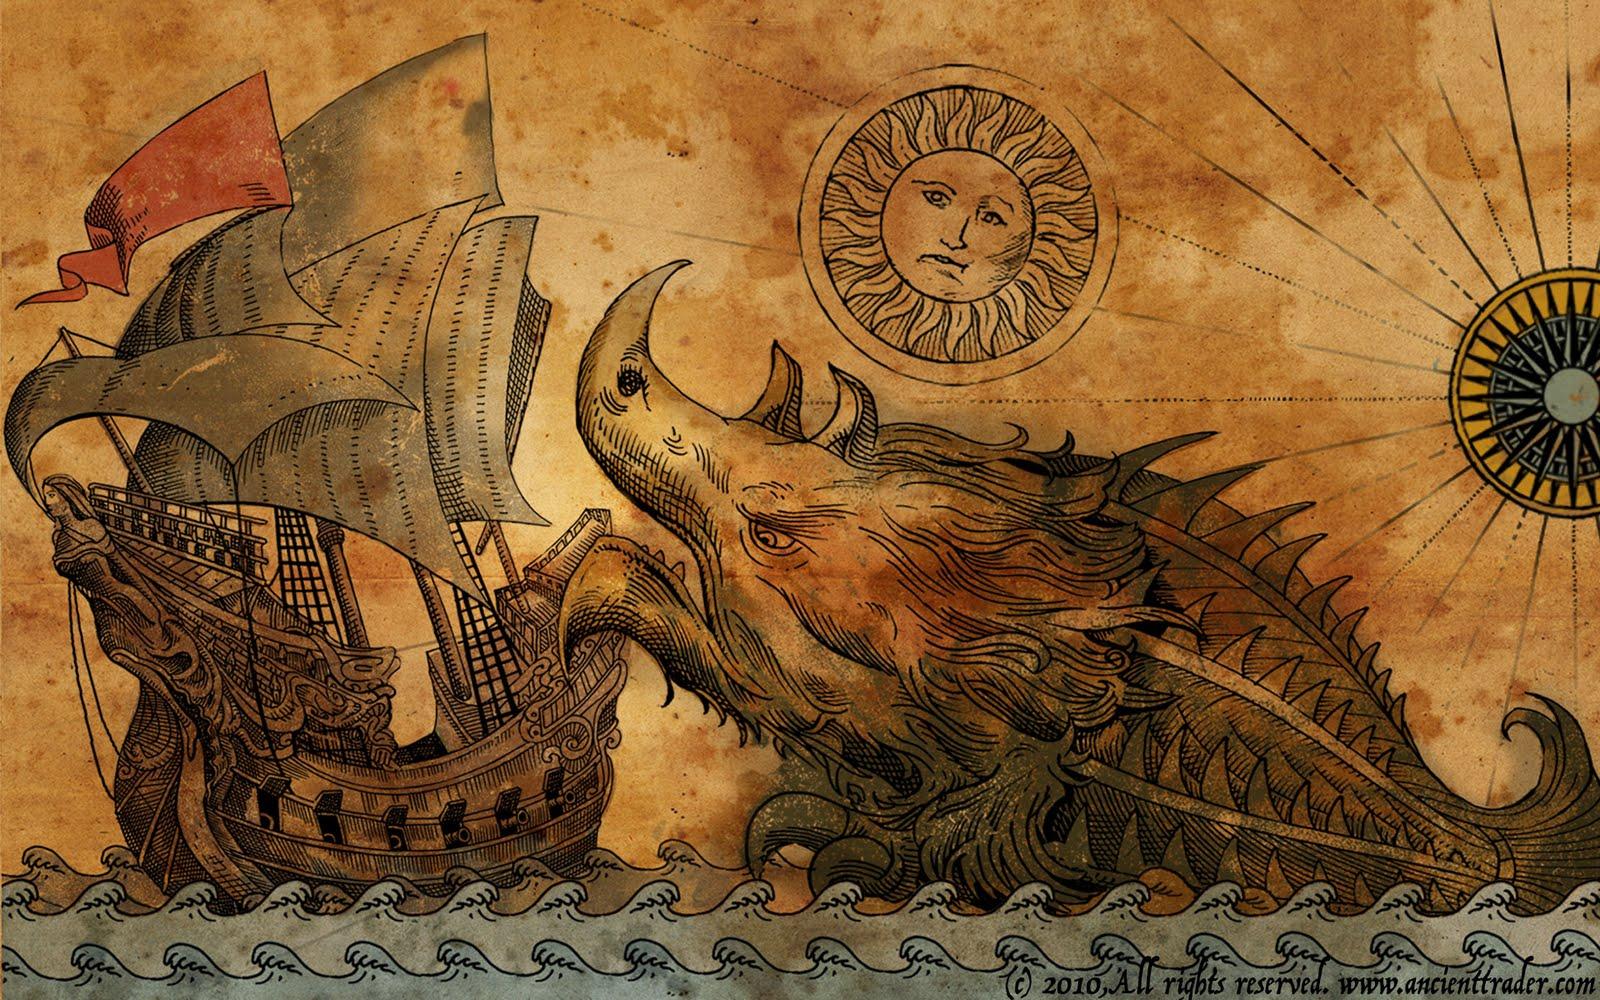 http://1.bp.blogspot.com/_XdP6Lp2ceqY/TGAIRgQcjjI/AAAAAAAAYX8/GV2zlGbKM-4/s1600/ancienttrader_wallpaper_1920.jpg